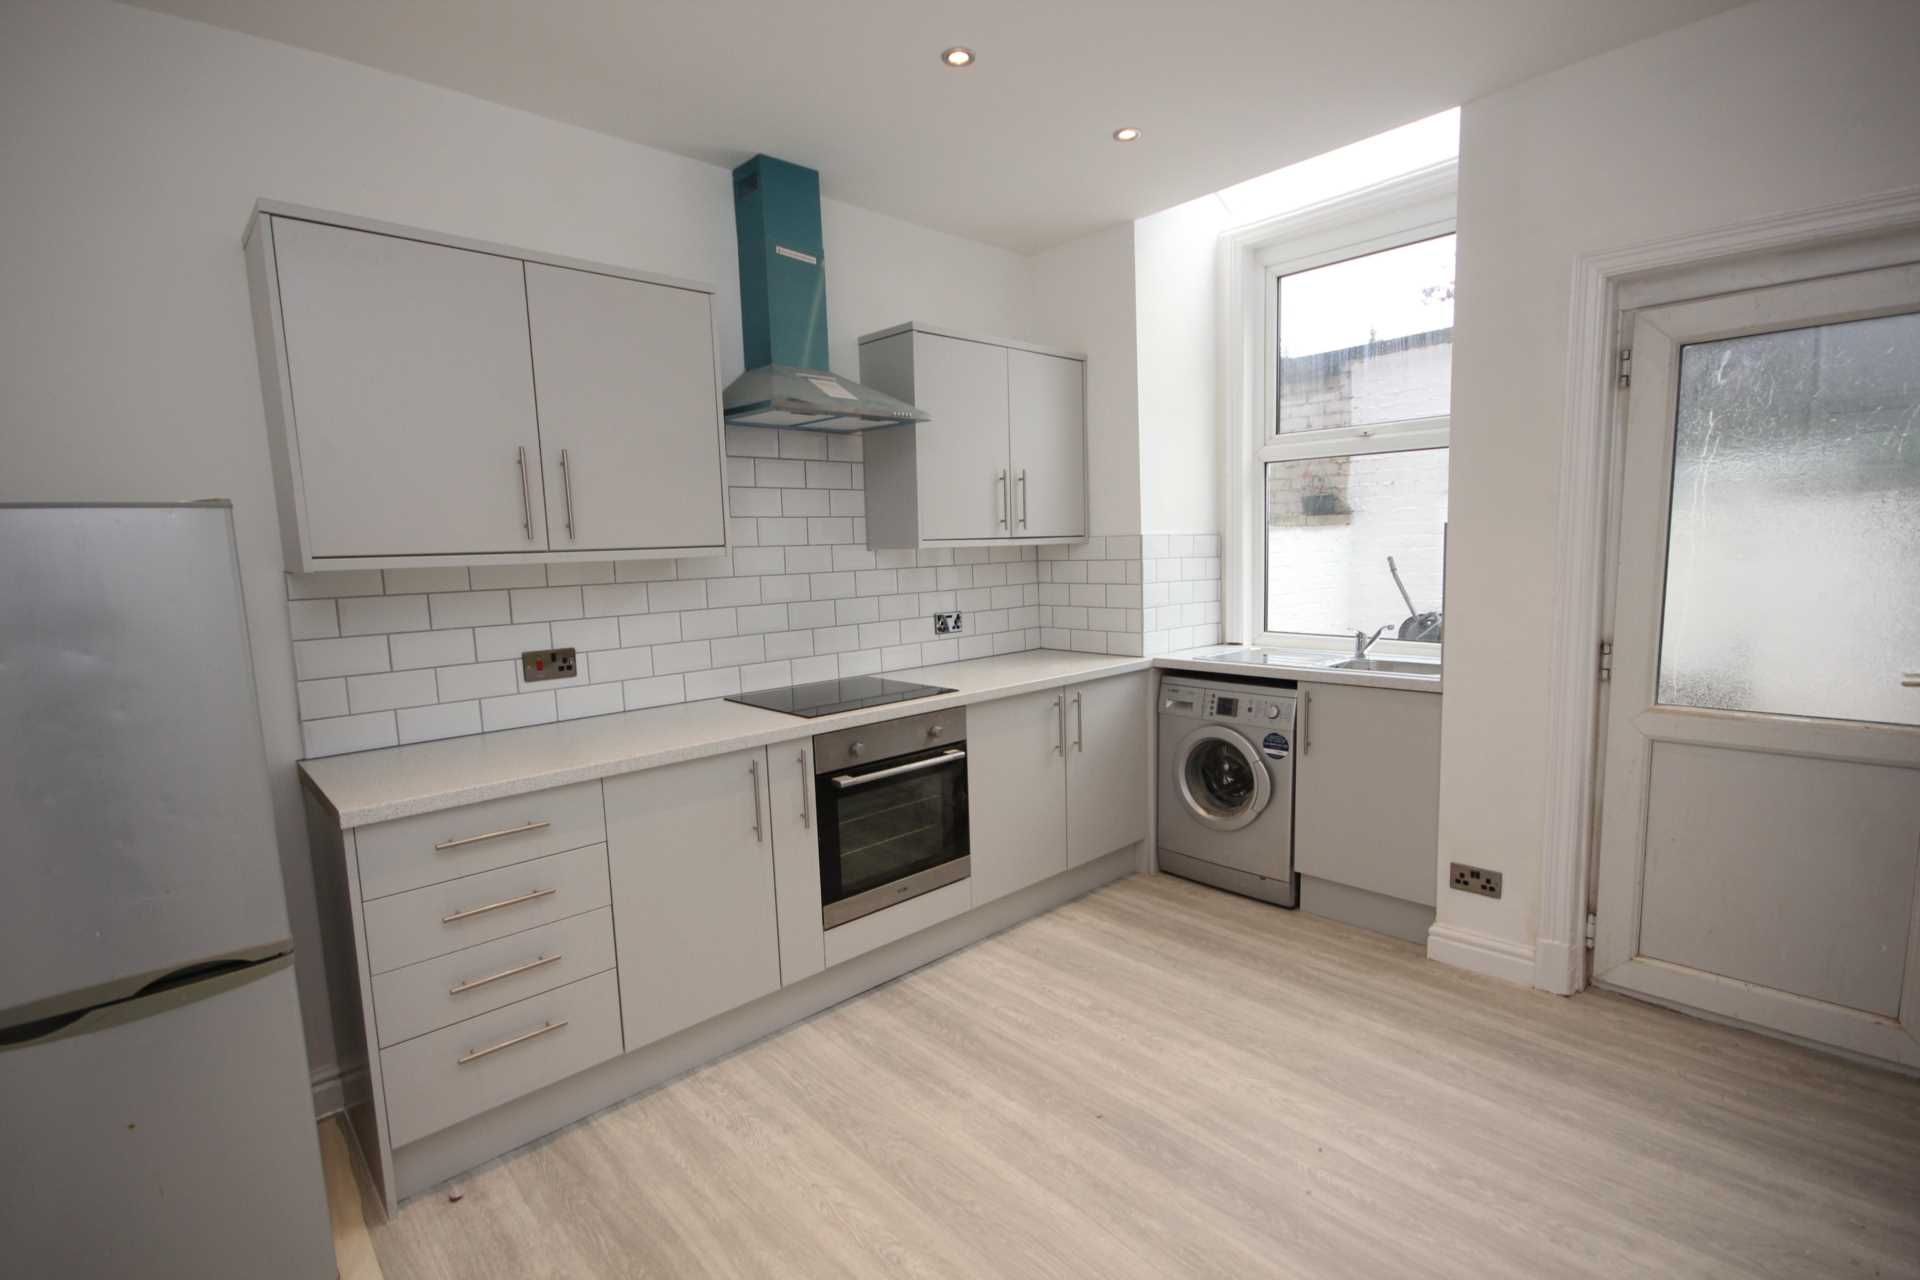 Prime 3 Bedroom Terraced House To Rent Whitelands Terrace Ashton Download Free Architecture Designs Embacsunscenecom